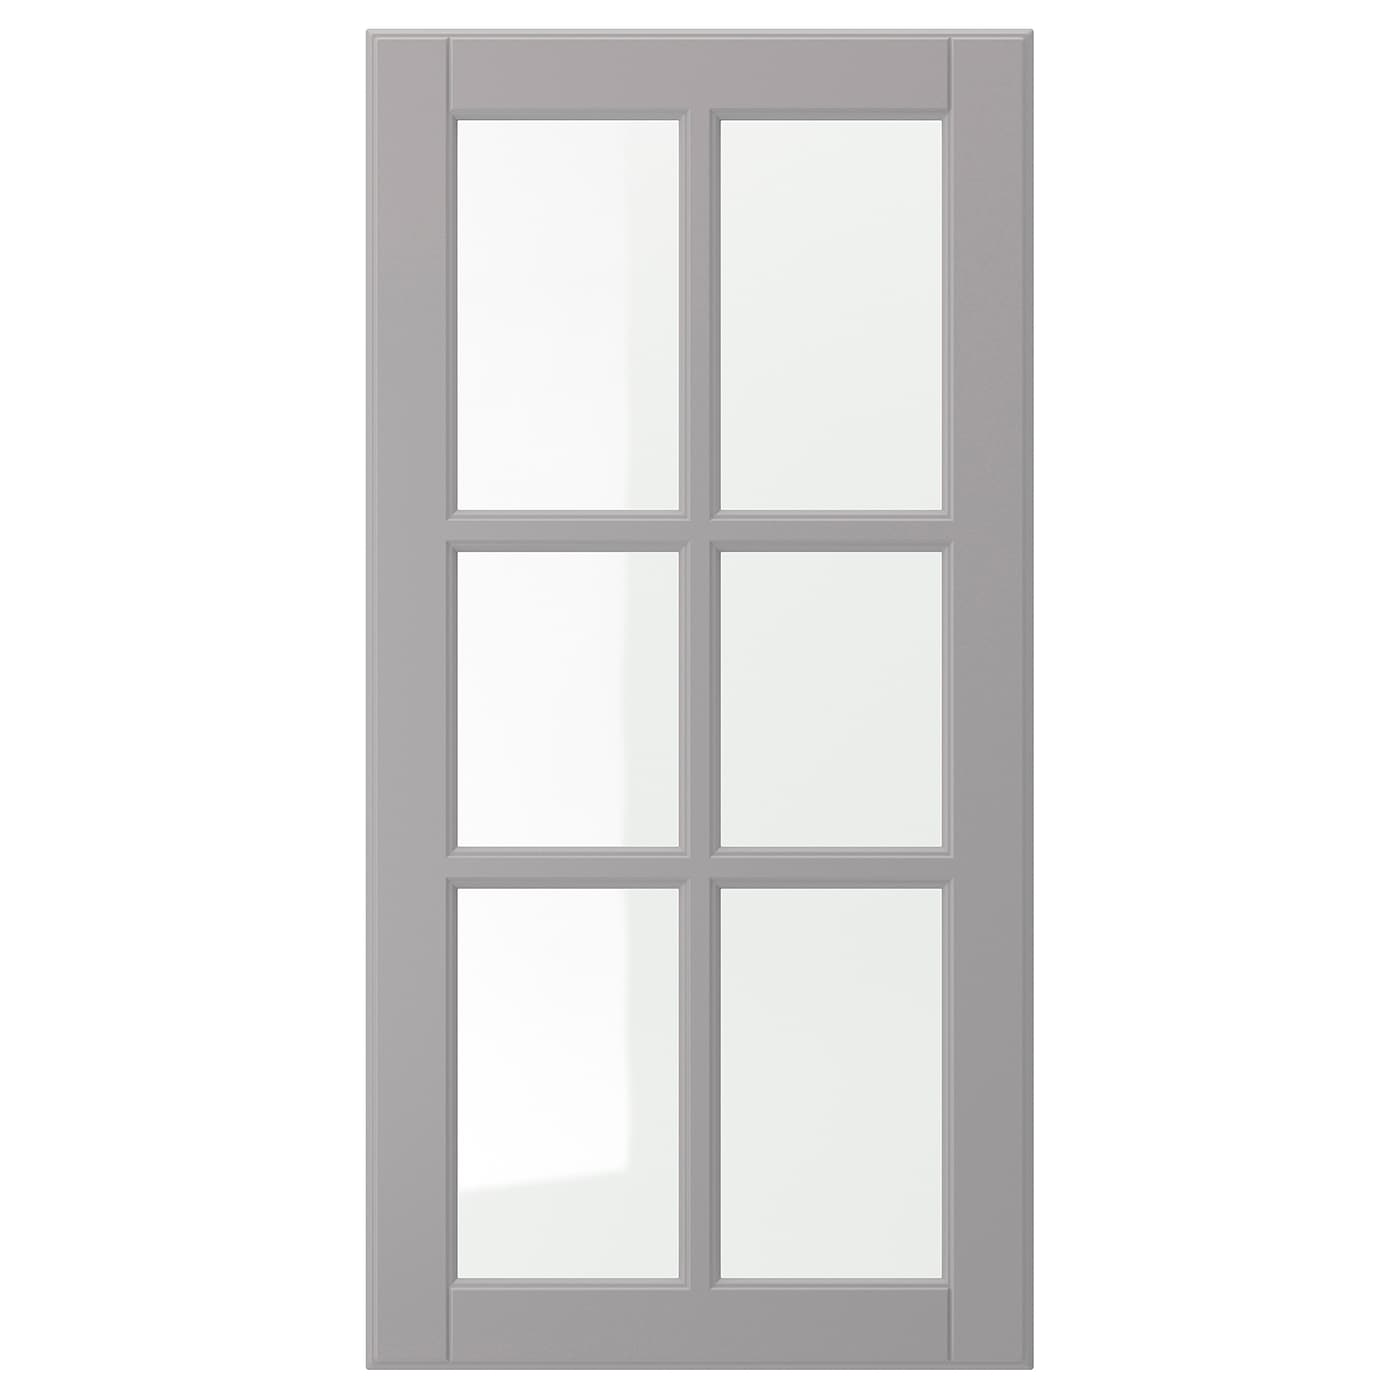 bodbyn porte vitr e gris 40 x 80 cm ikea. Black Bedroom Furniture Sets. Home Design Ideas